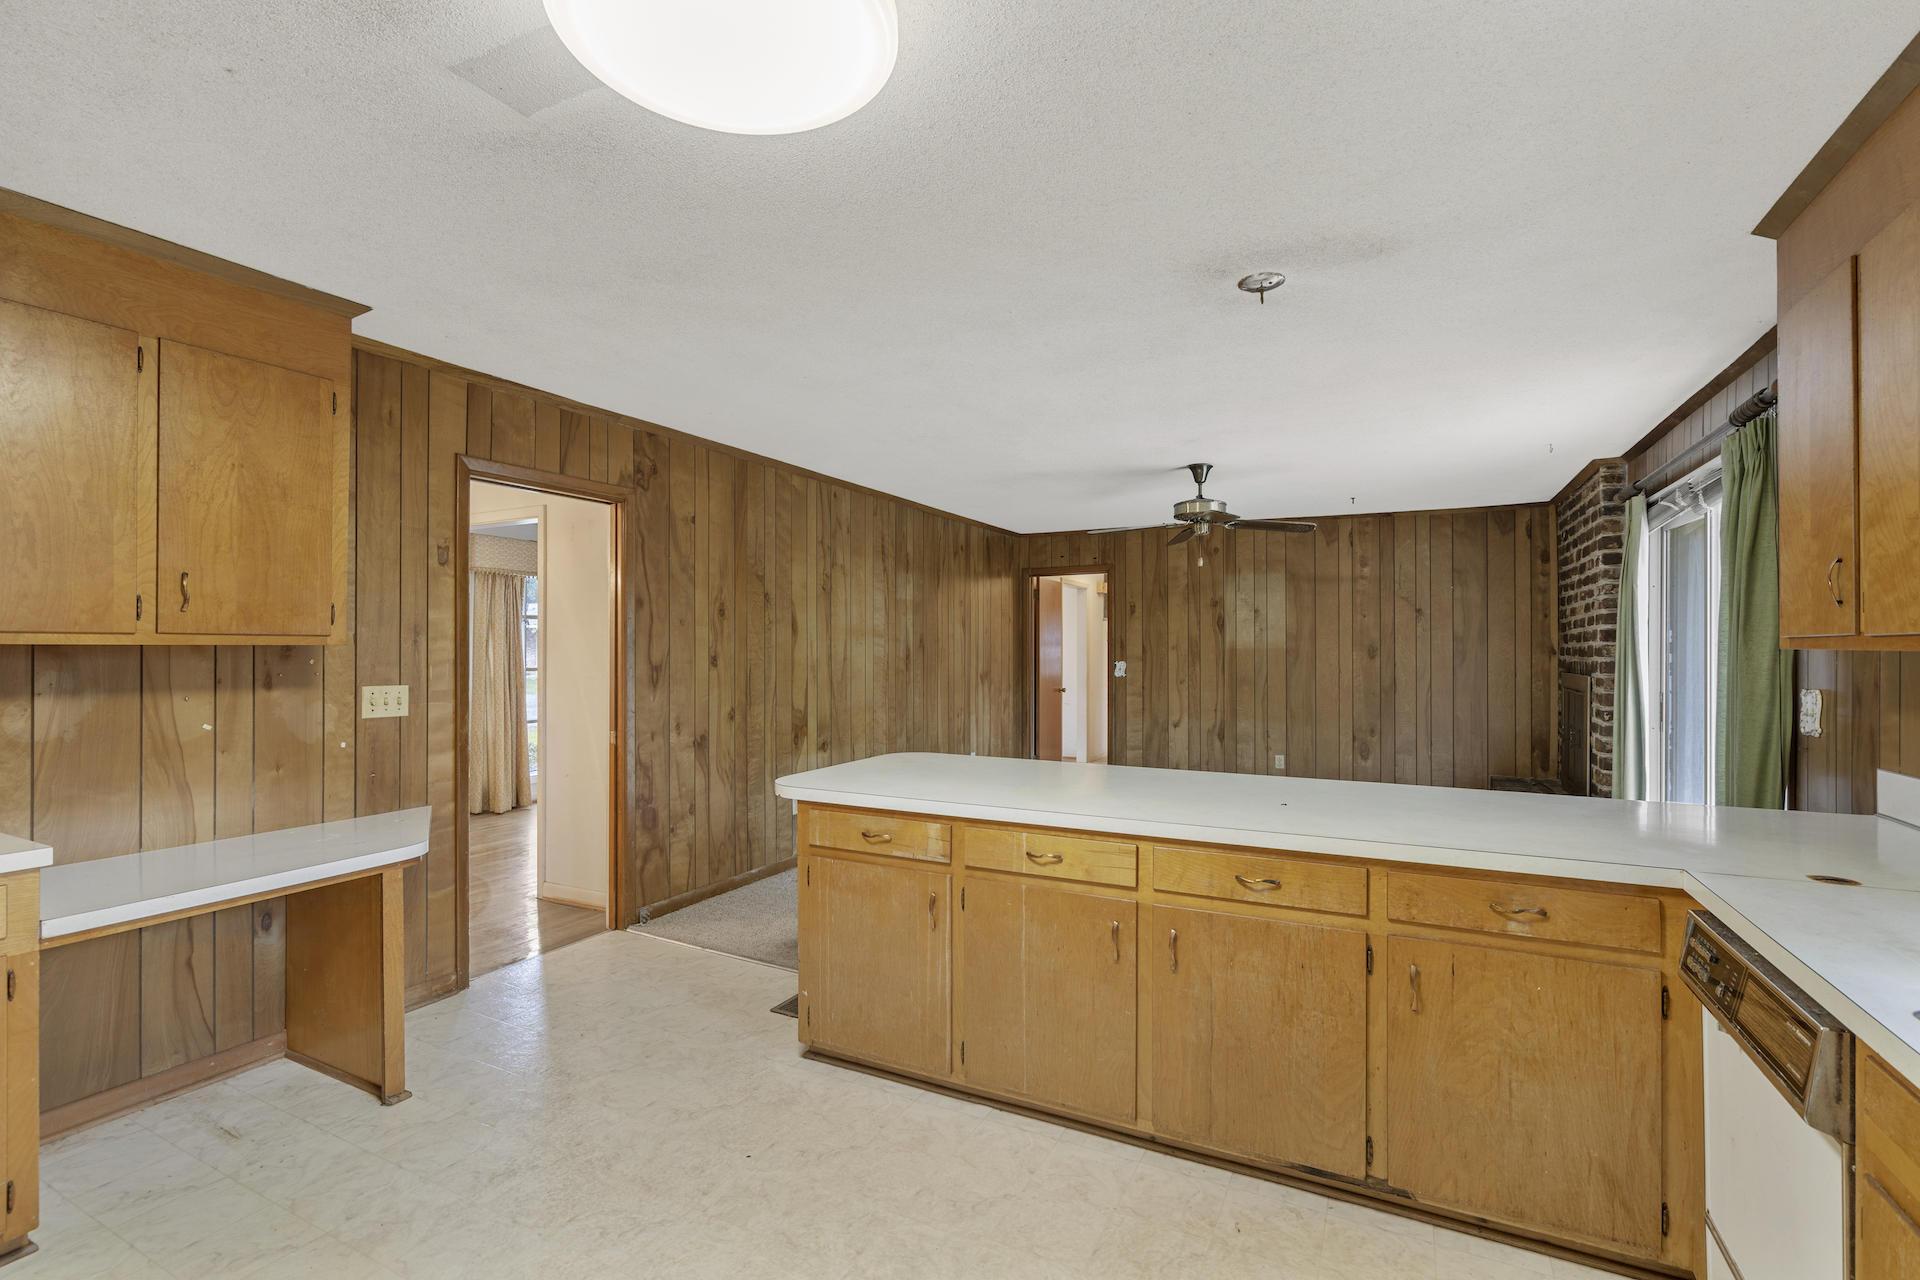 Charlestowne Estates I Homes For Sale - 1137 Culpepper, Charleston, SC - 5